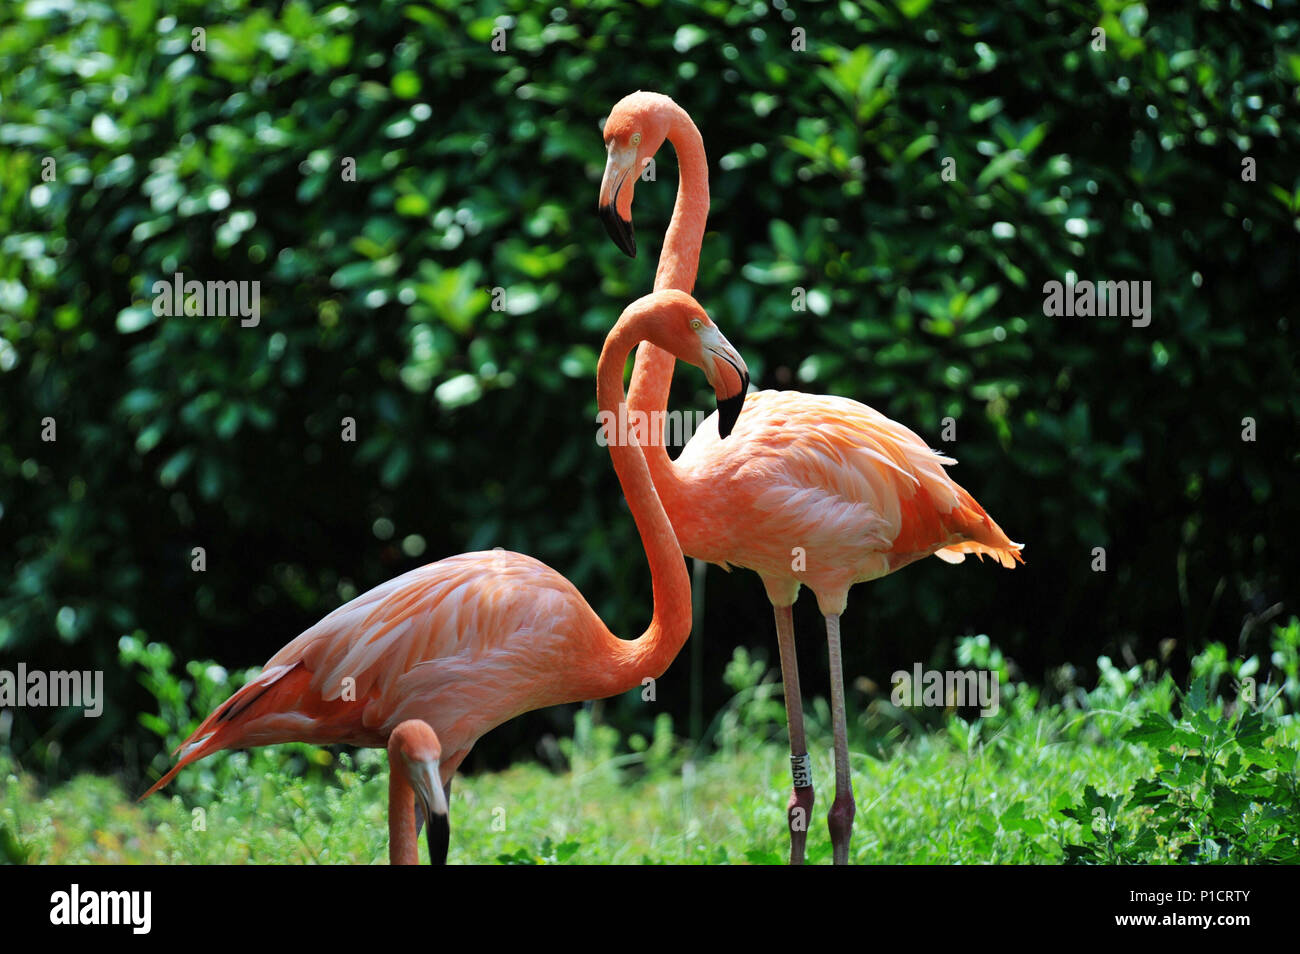 Qingdao, Qingdao, China. 12th June, 2018. Qingdao, CHINA-Flamingos at Qingdao Forest Wildlife World in Qingdao, east China's Shandong Province. Credit: SIPA Asia/ZUMA Wire/Alamy Live News - Stock Image